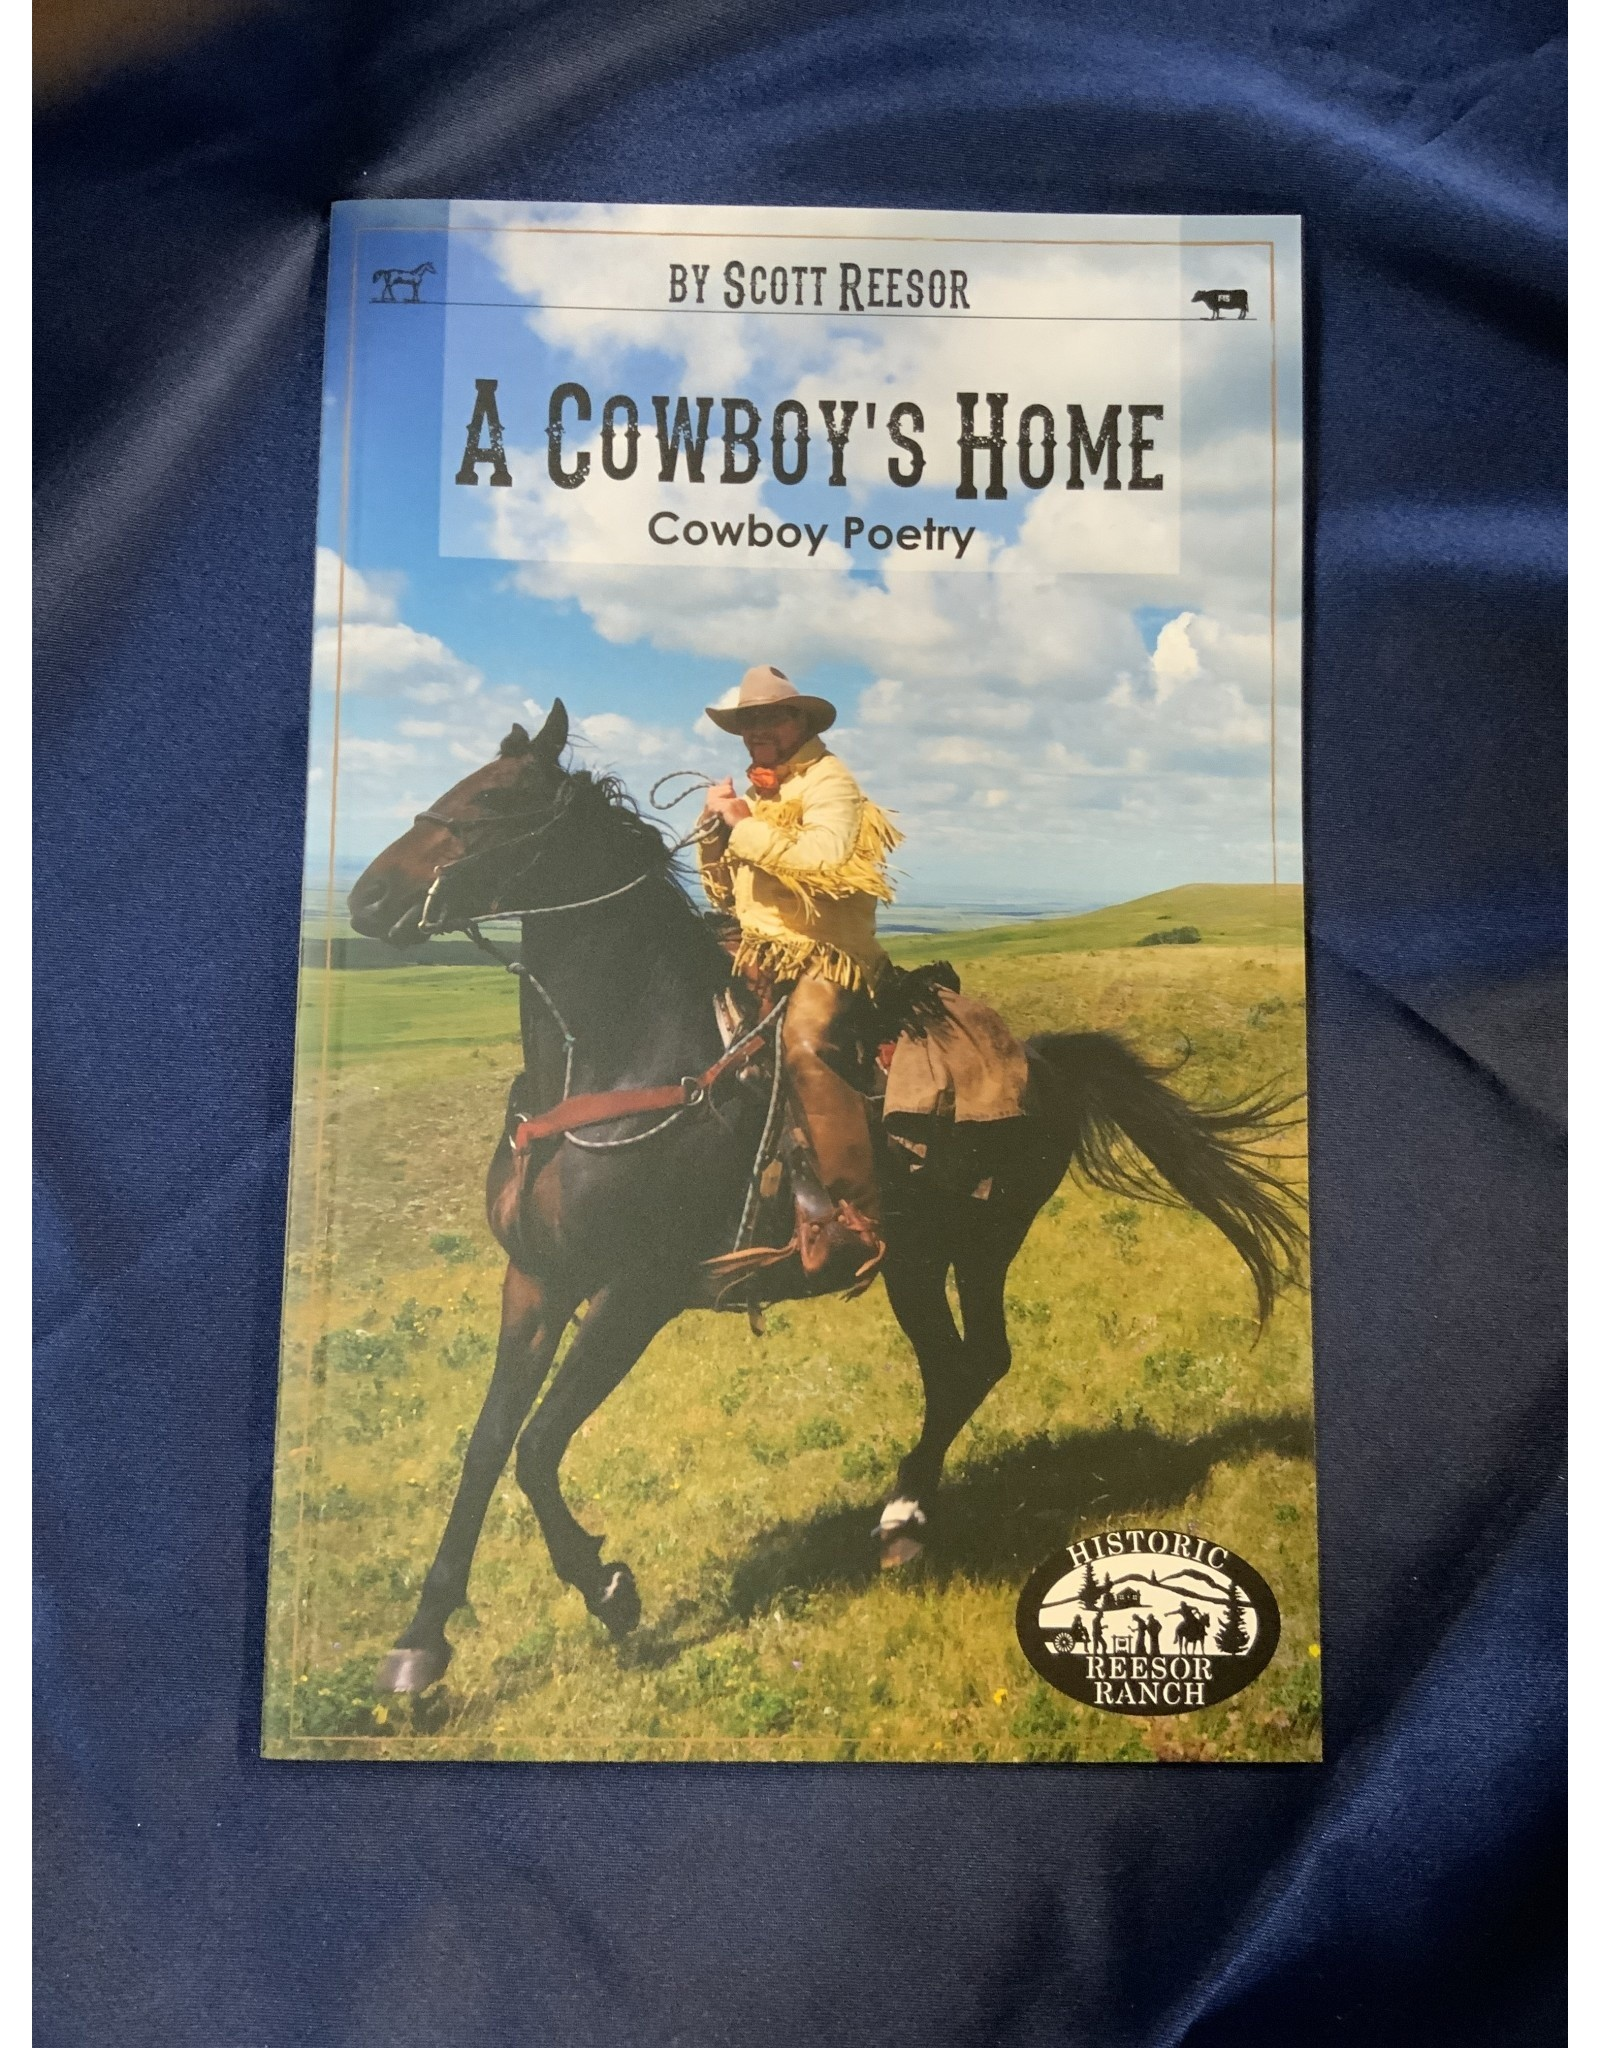 A Cowboy's Home - Cowboy Poetry - Book